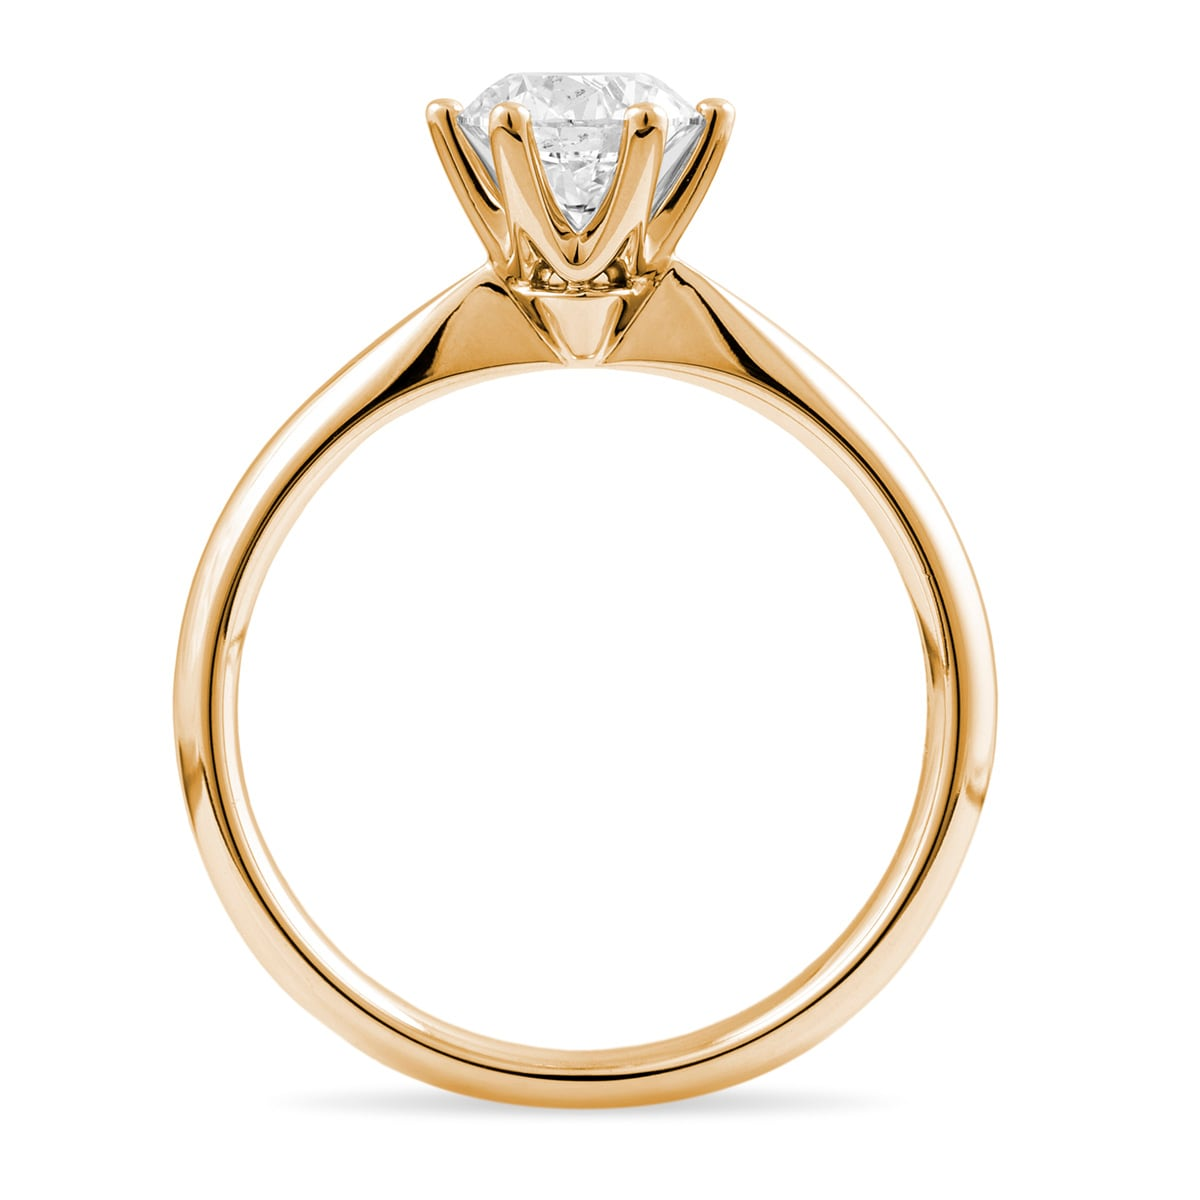 Sandin_56_One_Carat_ring_RG_1,0ct_V1_hos Jarl_Sandin